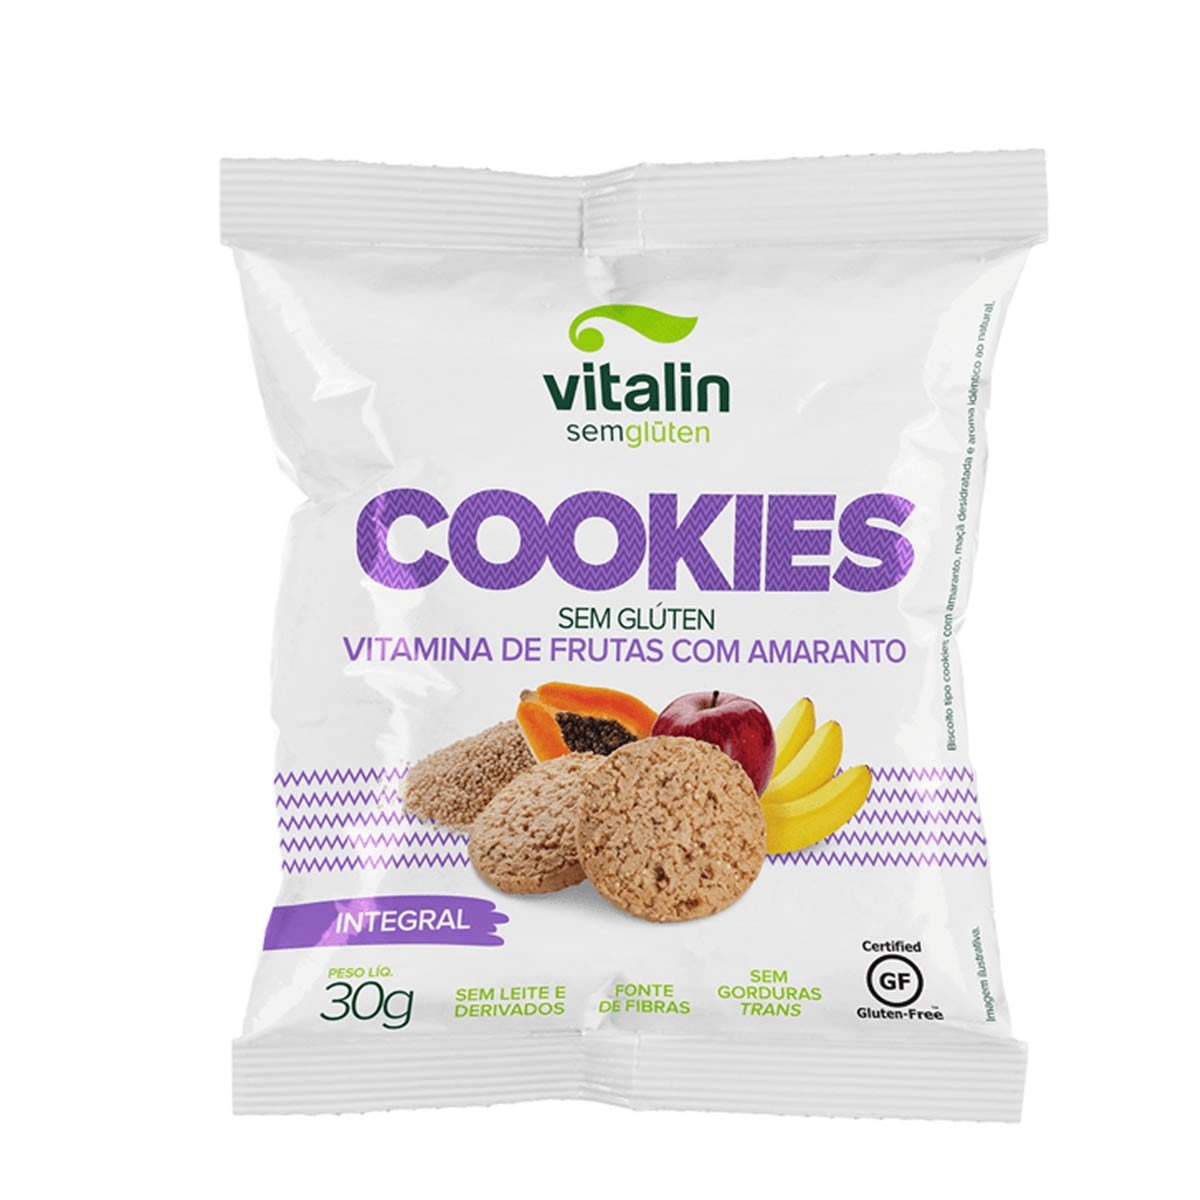 Cookie Sabor Vitamina de Frutas com Amaranto 30g - Vitalin